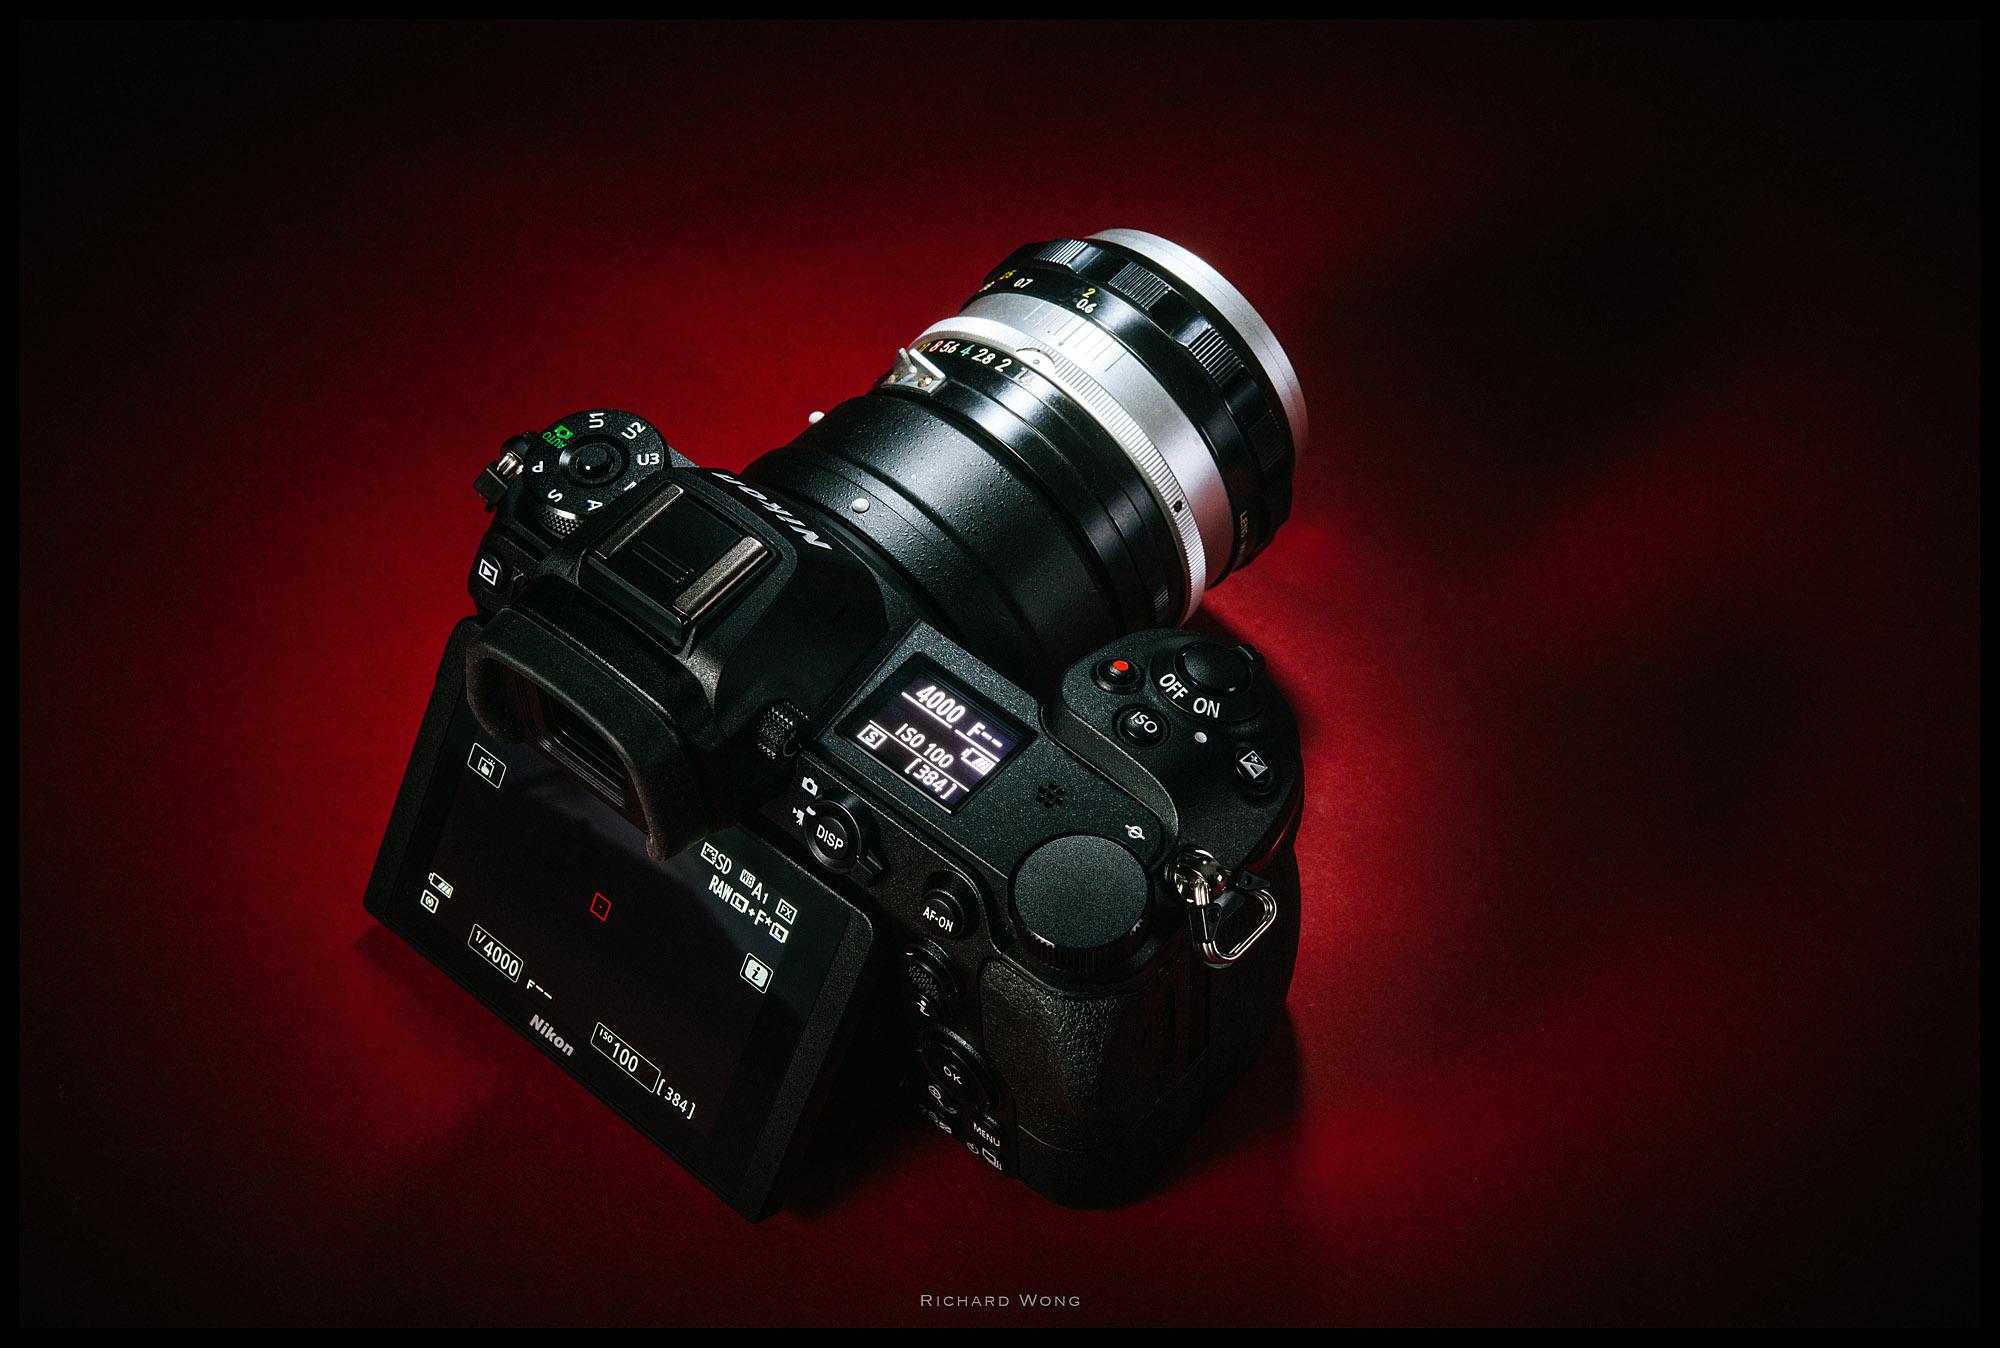 Nikon Z6 Vs D750 Review In Depth Comparison Review